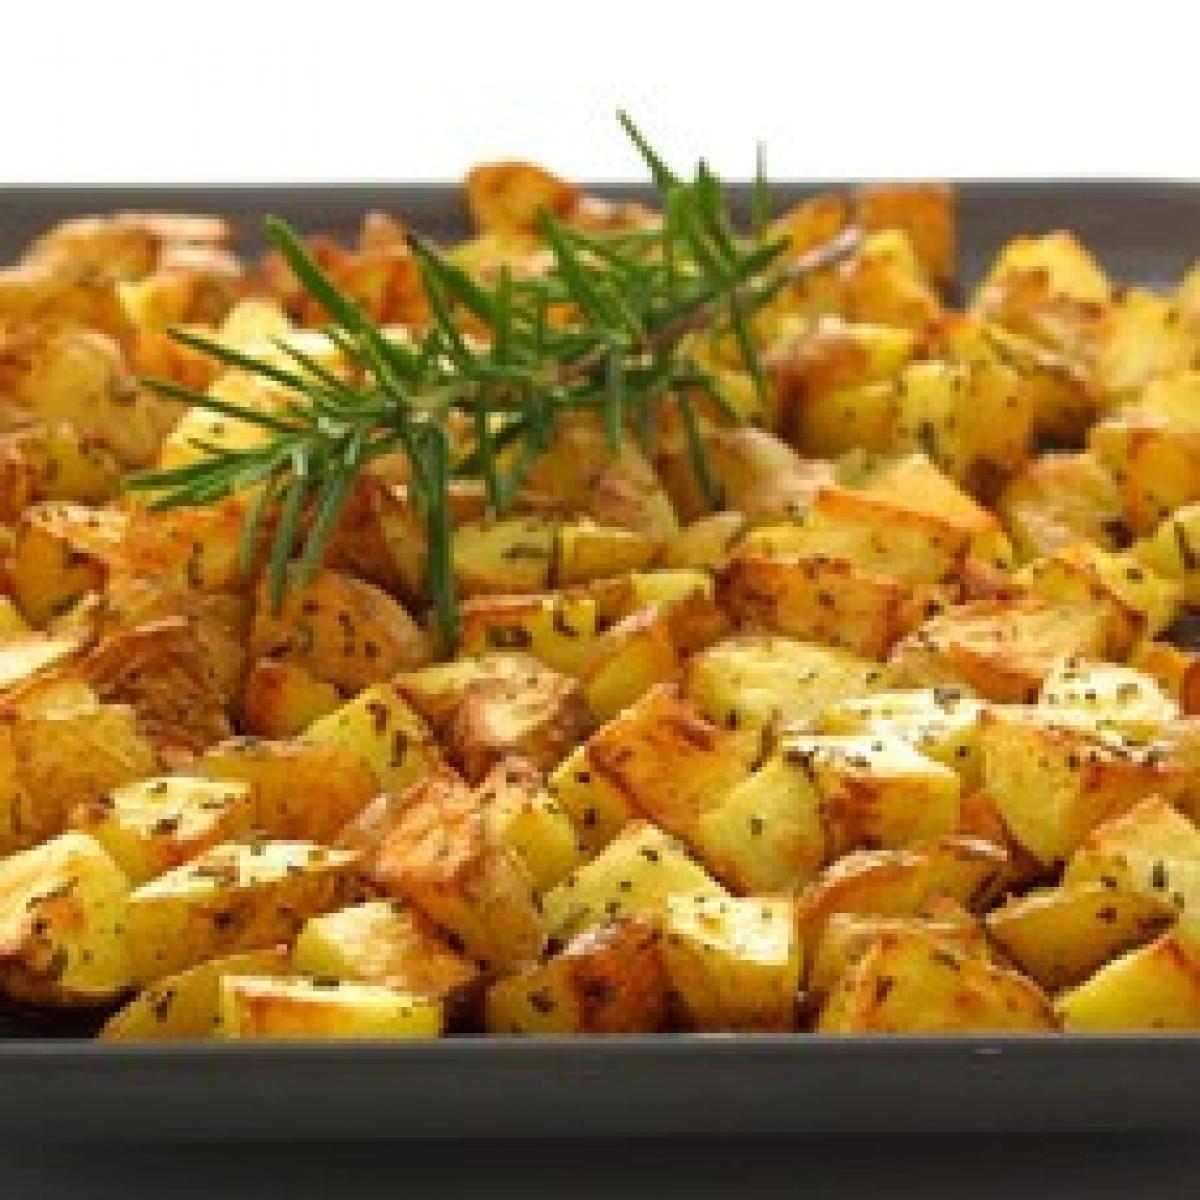 Su078 oven roast potatoes3 20243